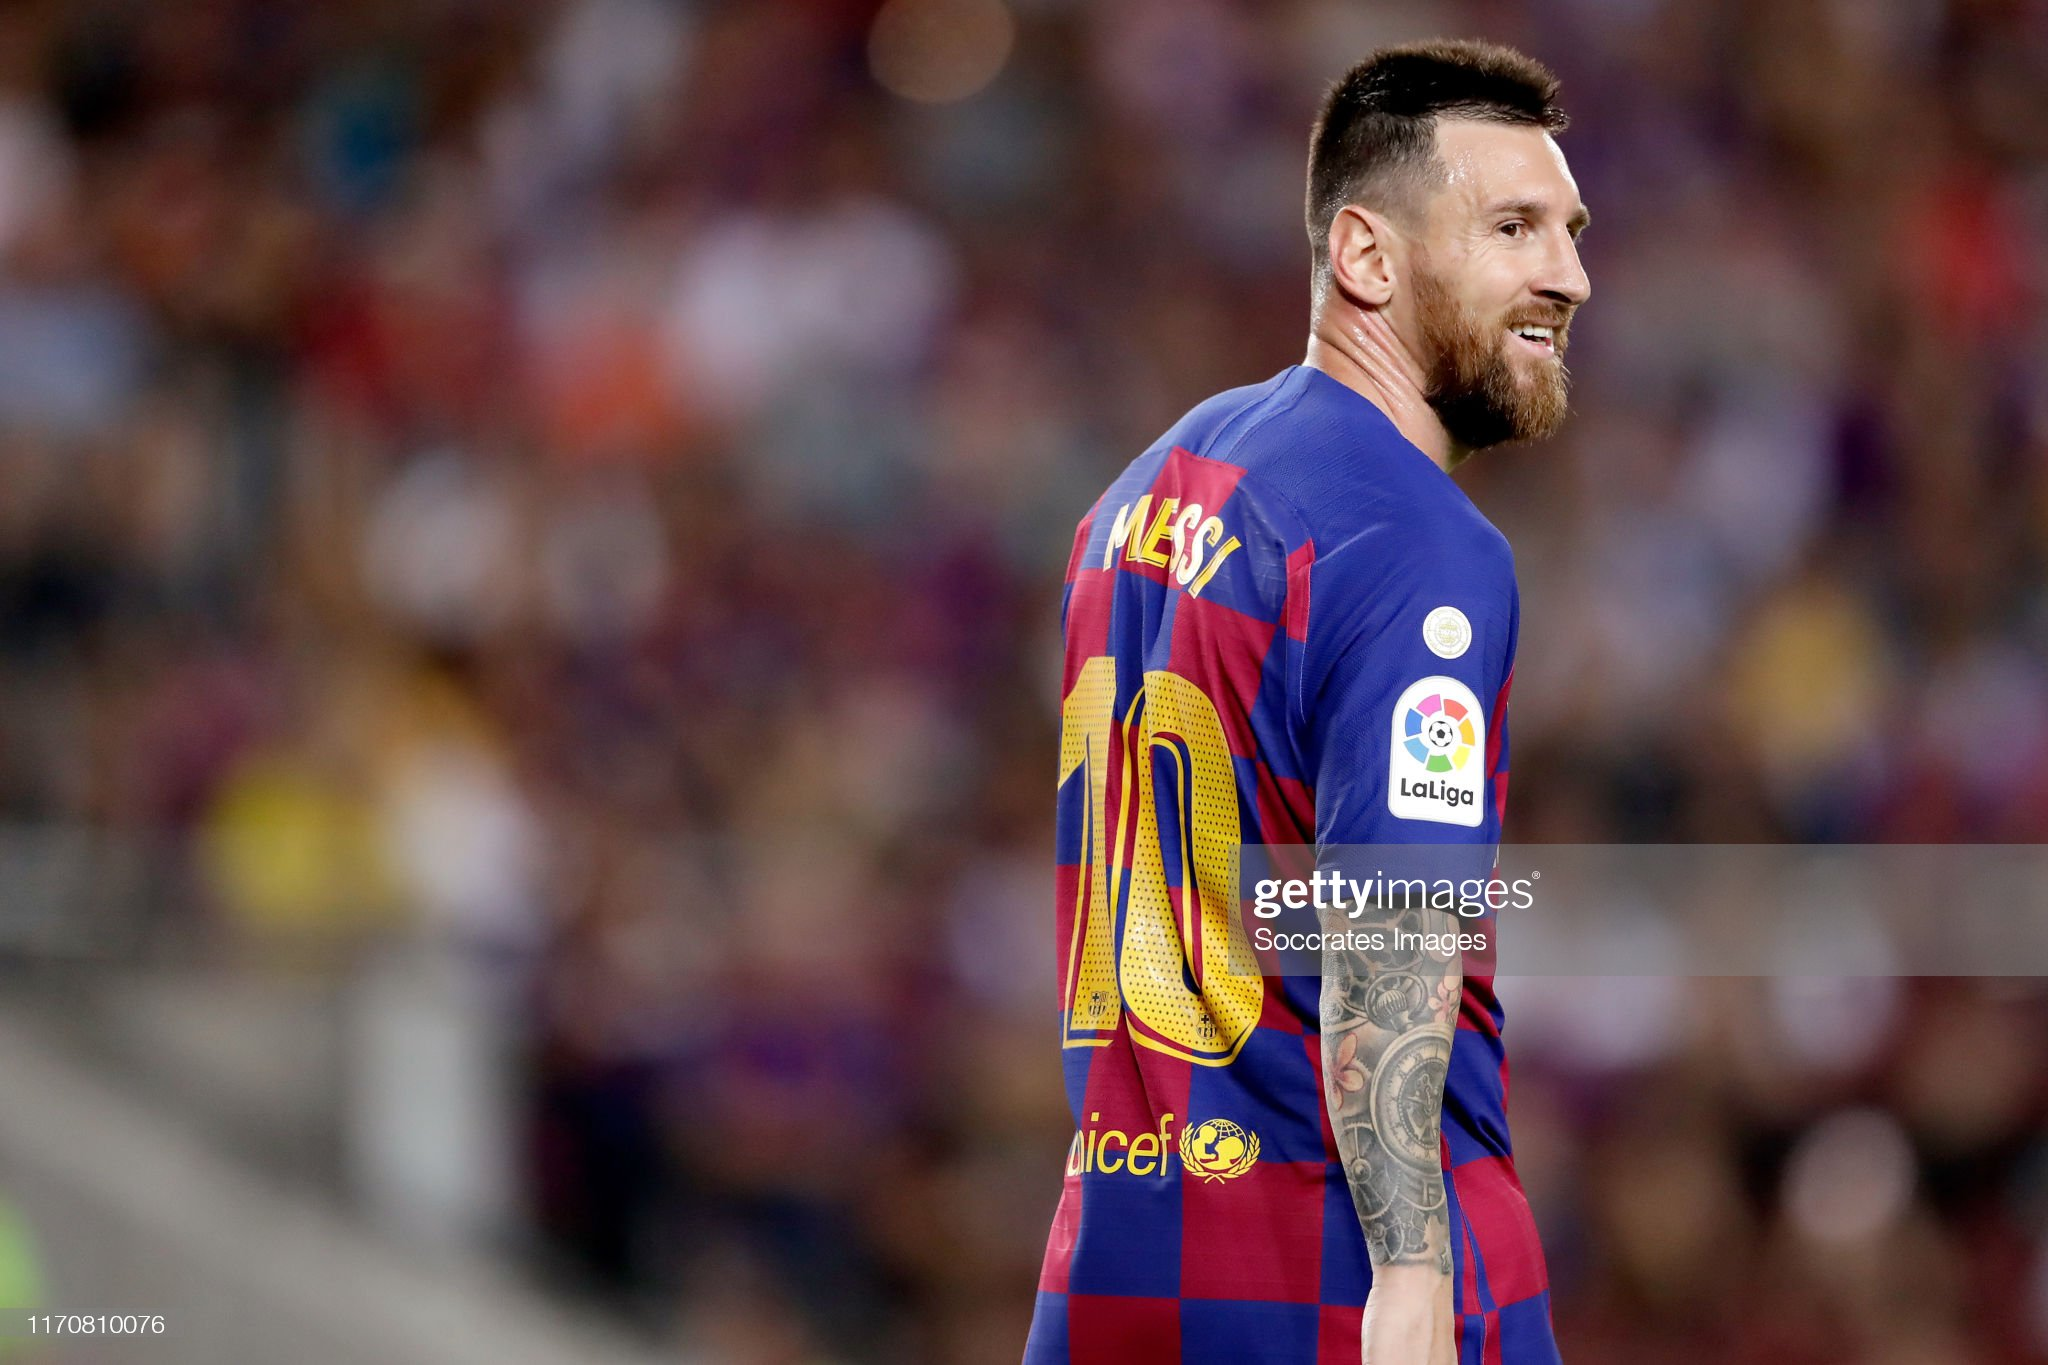 صور مباراة : برشلونة - فياريال 2-1 ( 24-09-2019 )  Lionel-messi-of-fc-barcelona-during-the-la-liga-santander-match-fc-picture-id1170810076?s=2048x2048